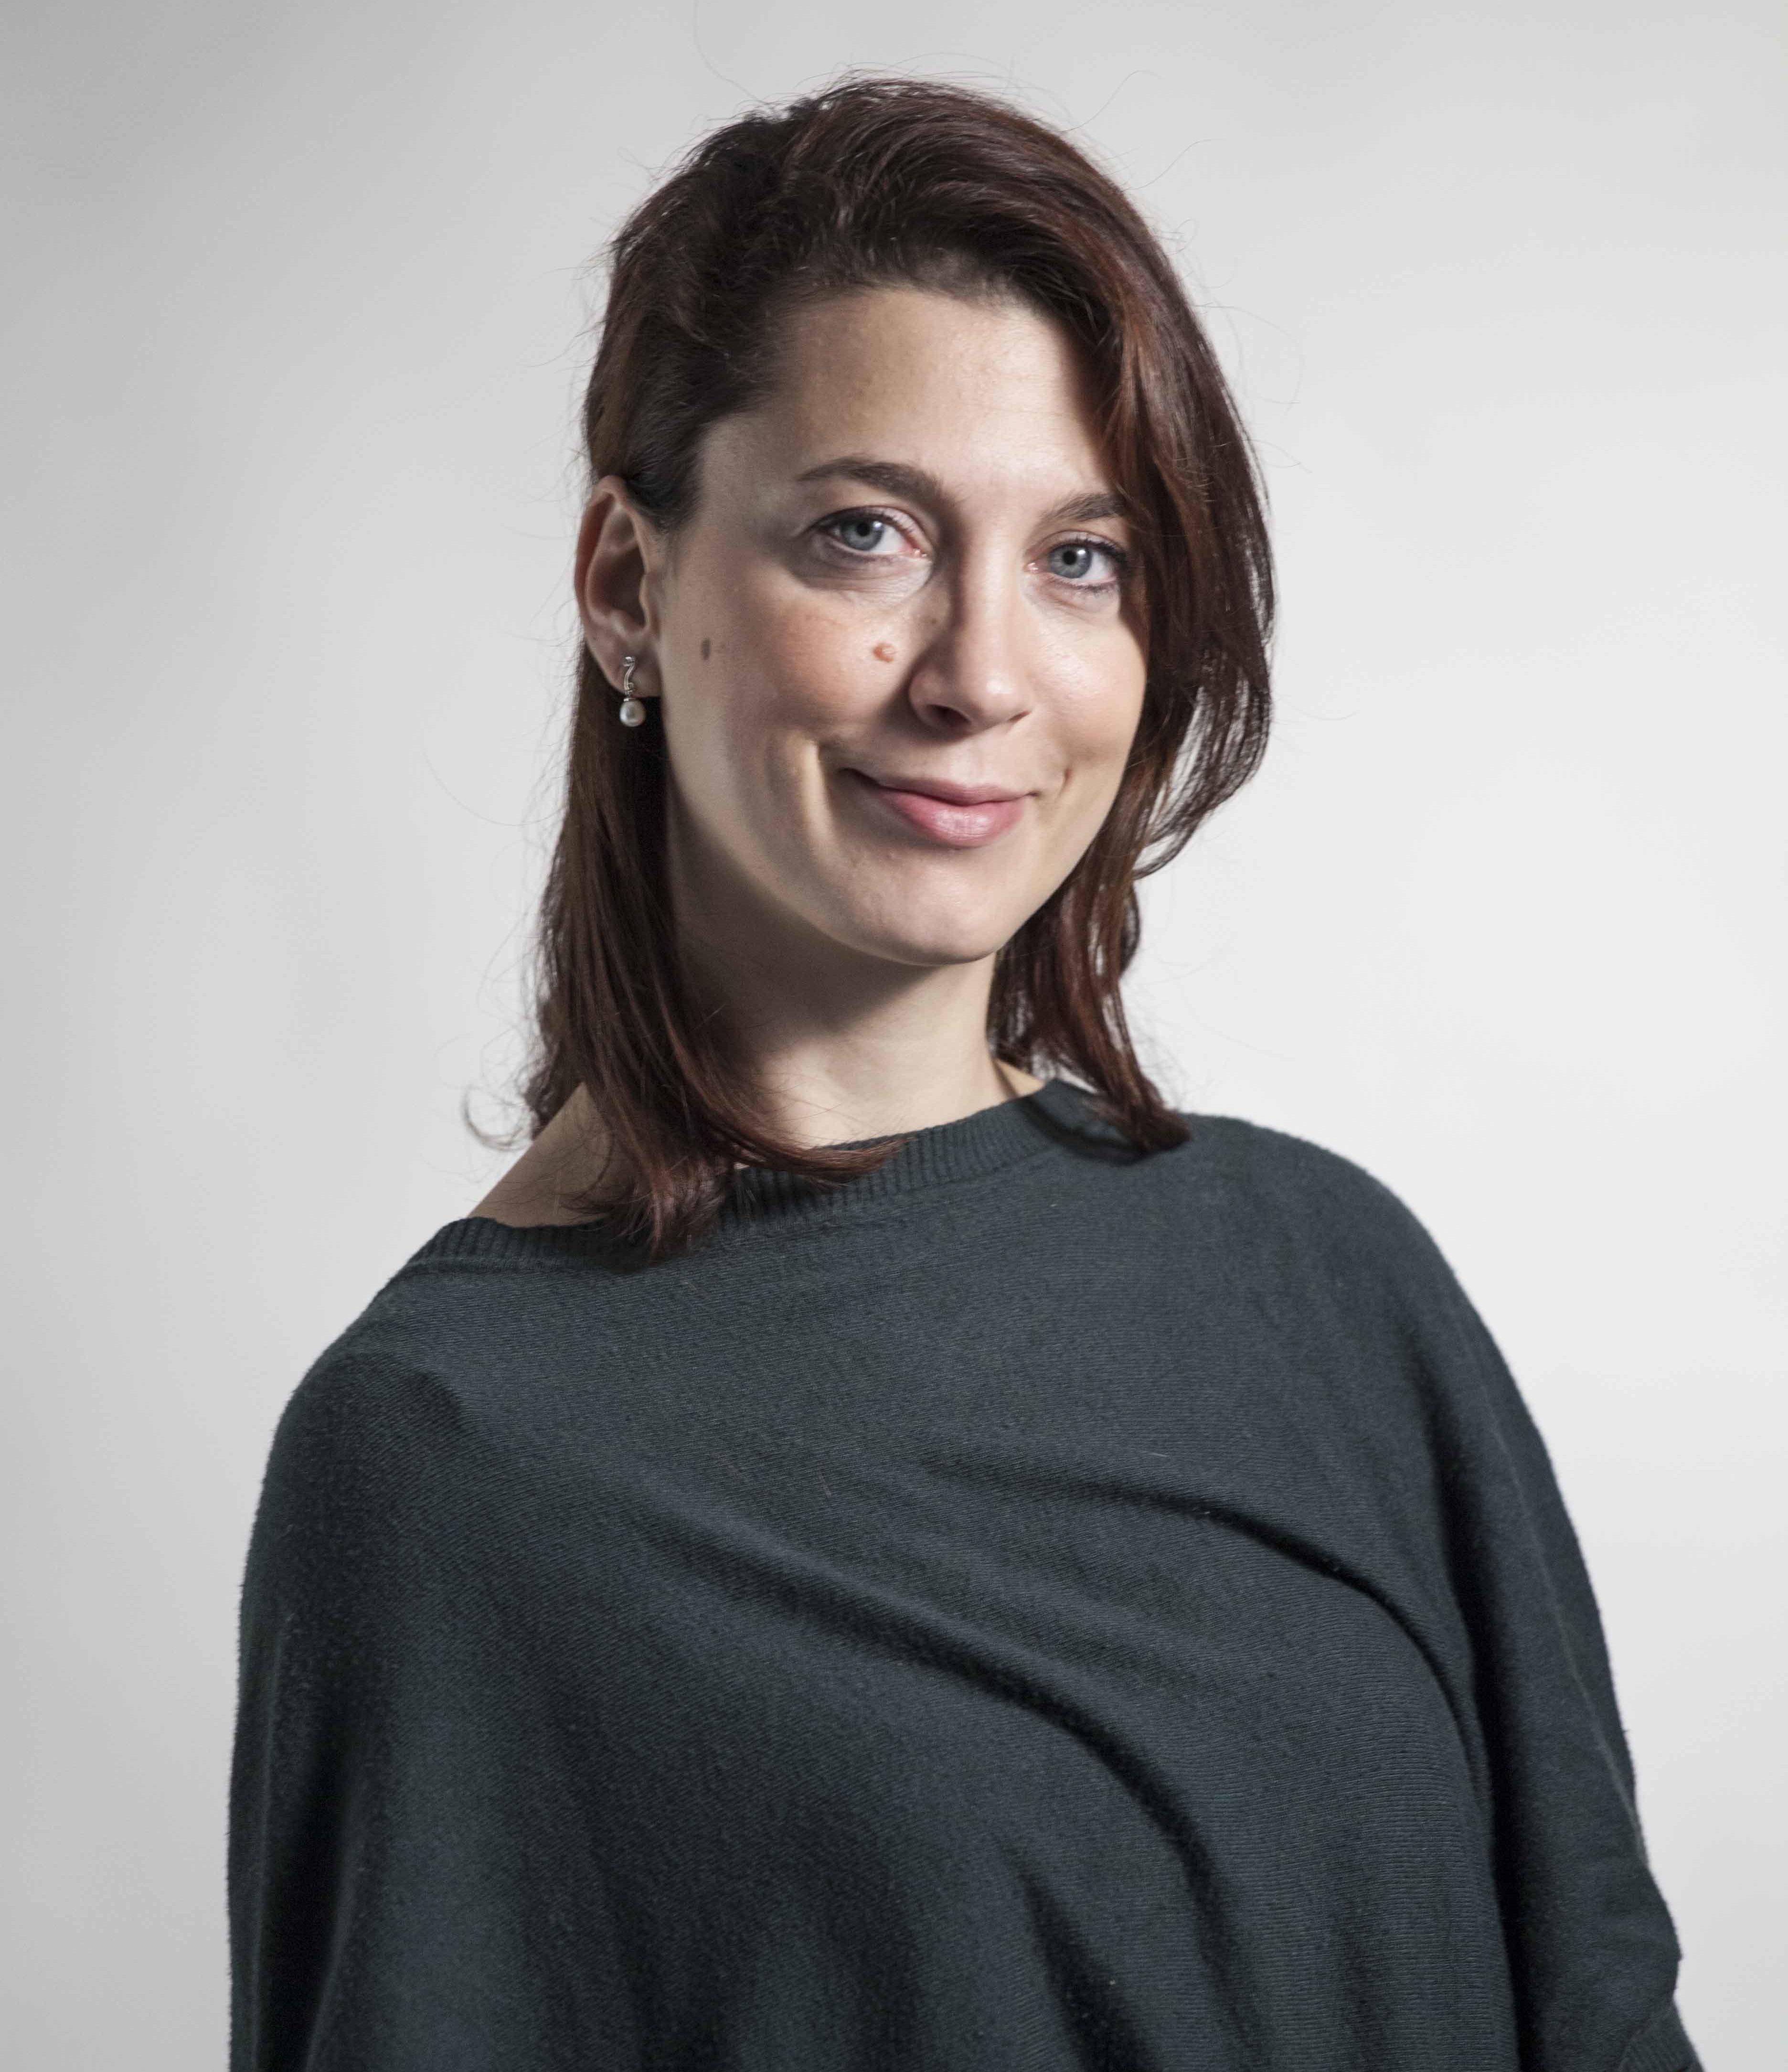 Flavia Sallusti